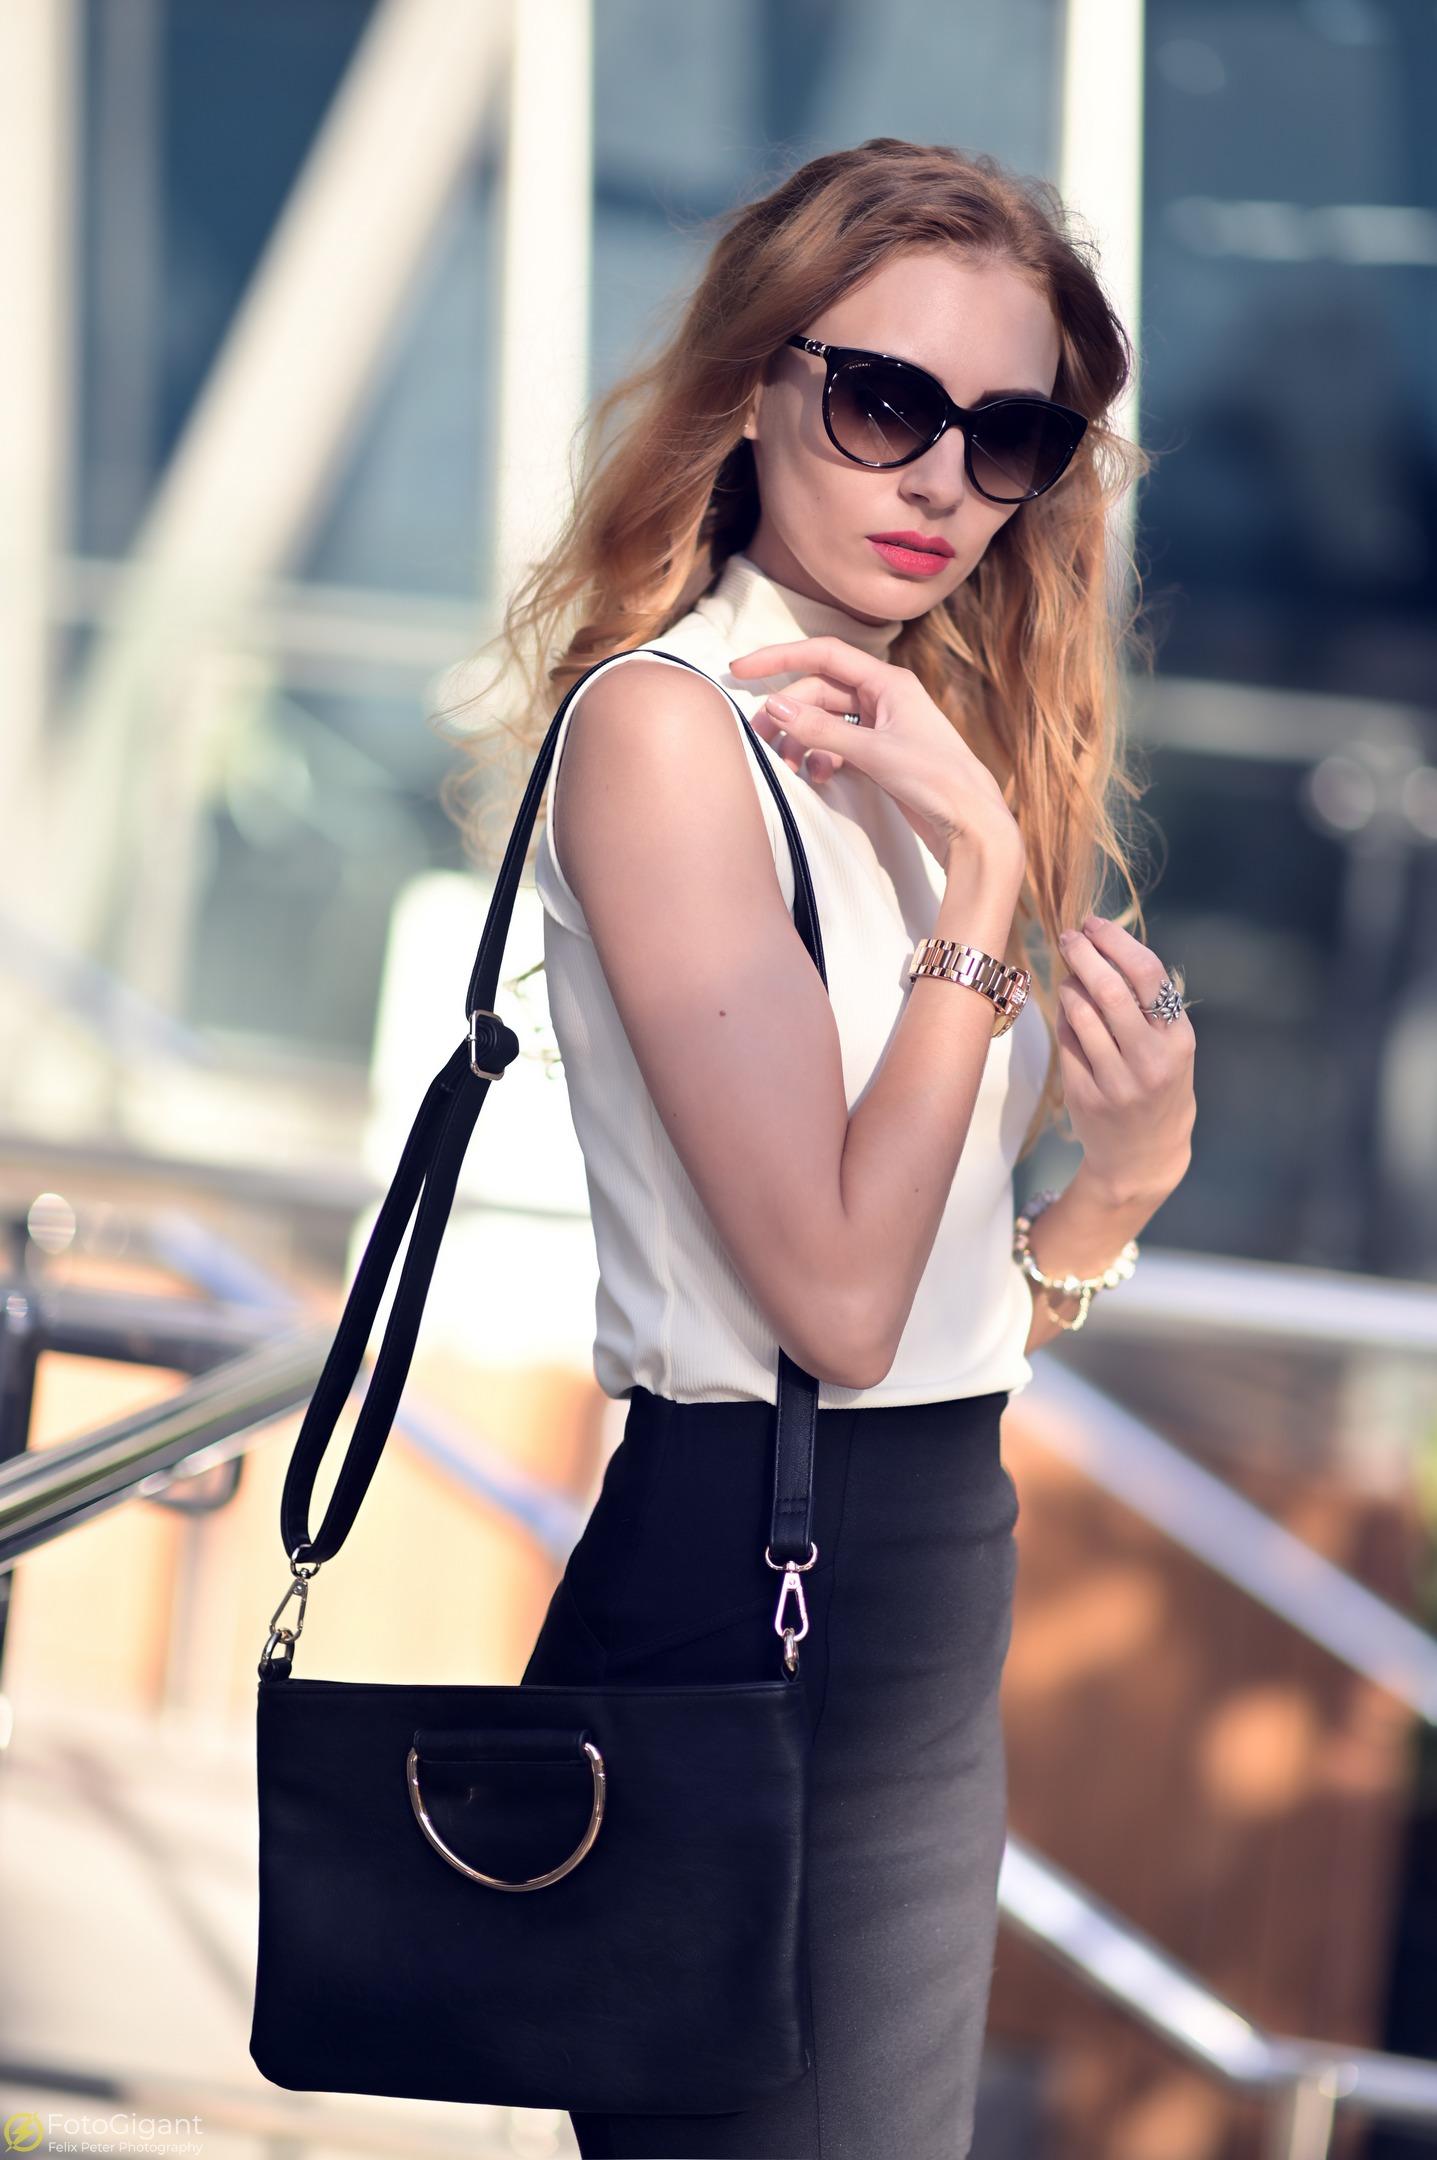 Alina_Fashion-Photography_Perth_23.jpg